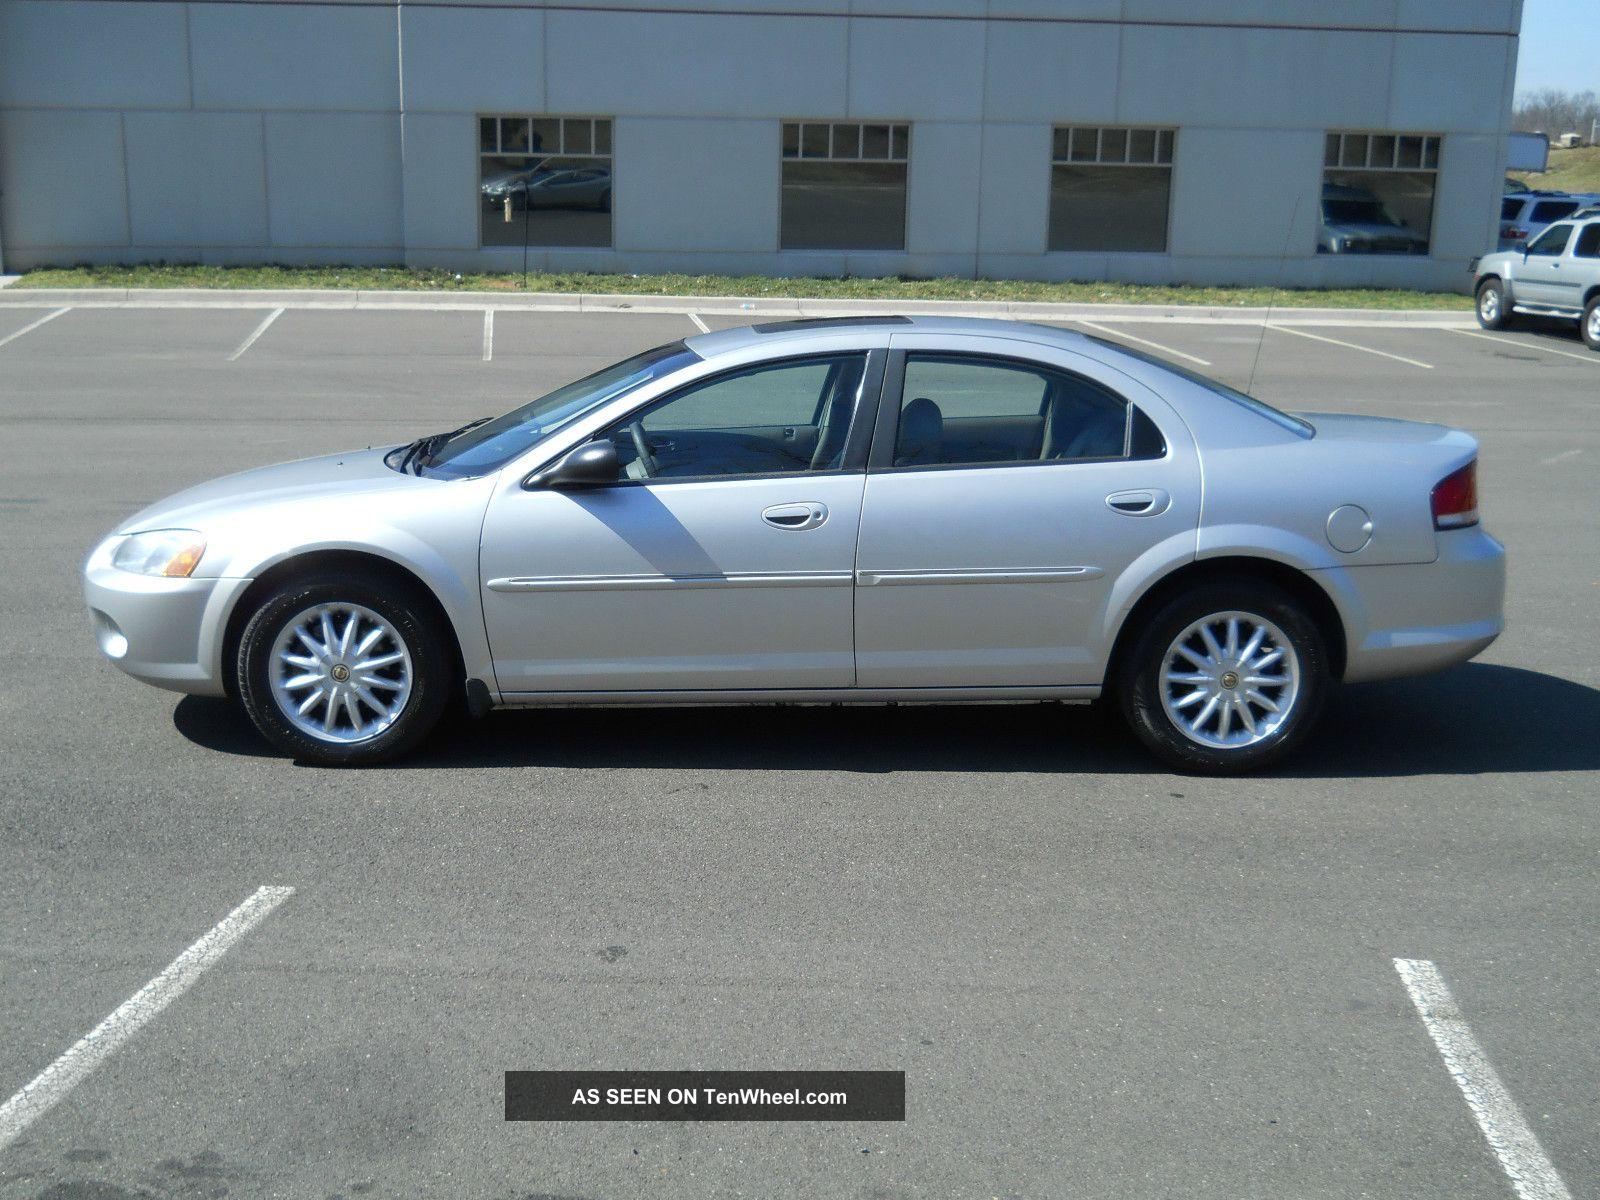 2002 Chrysler Sebring Lxi Sedan 4 Door 2 7l